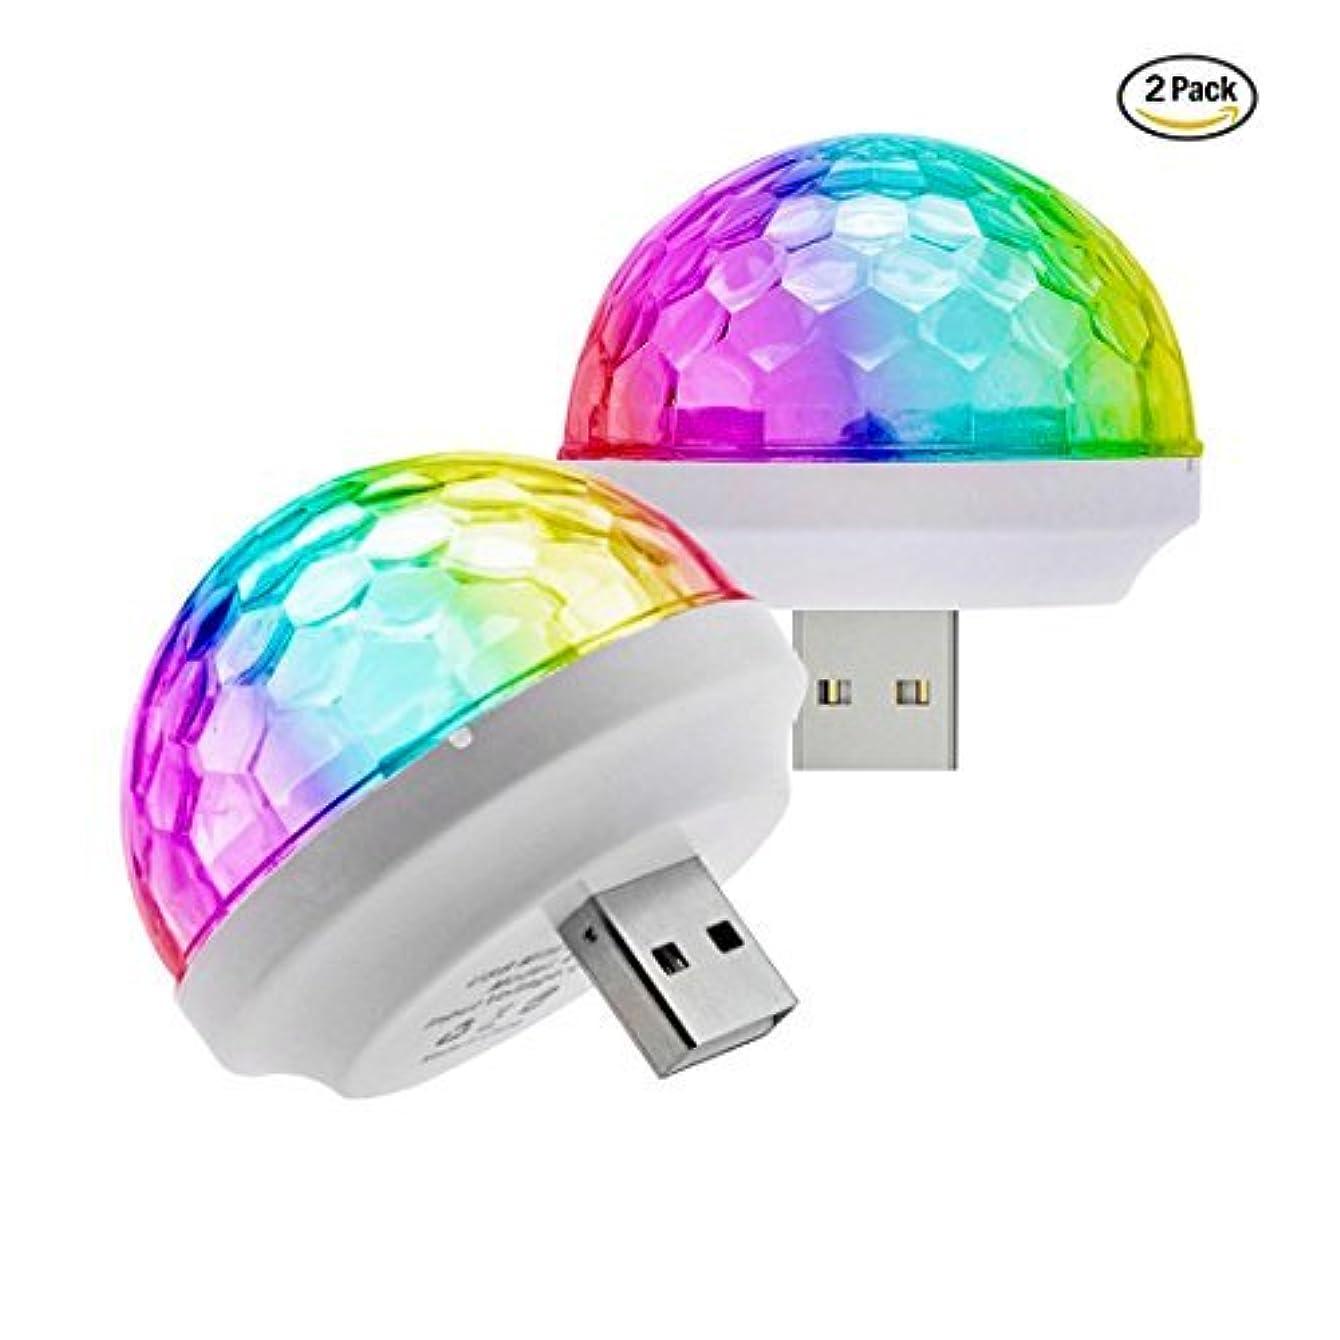 USB Mini Stage DJ Light Disco Ball Lamp Home Pajama Party Strobe Light Disco LED Bulb for Birthday Gift Club Wedding Celebration Karaoke Xmas Decorations (2-PACK)